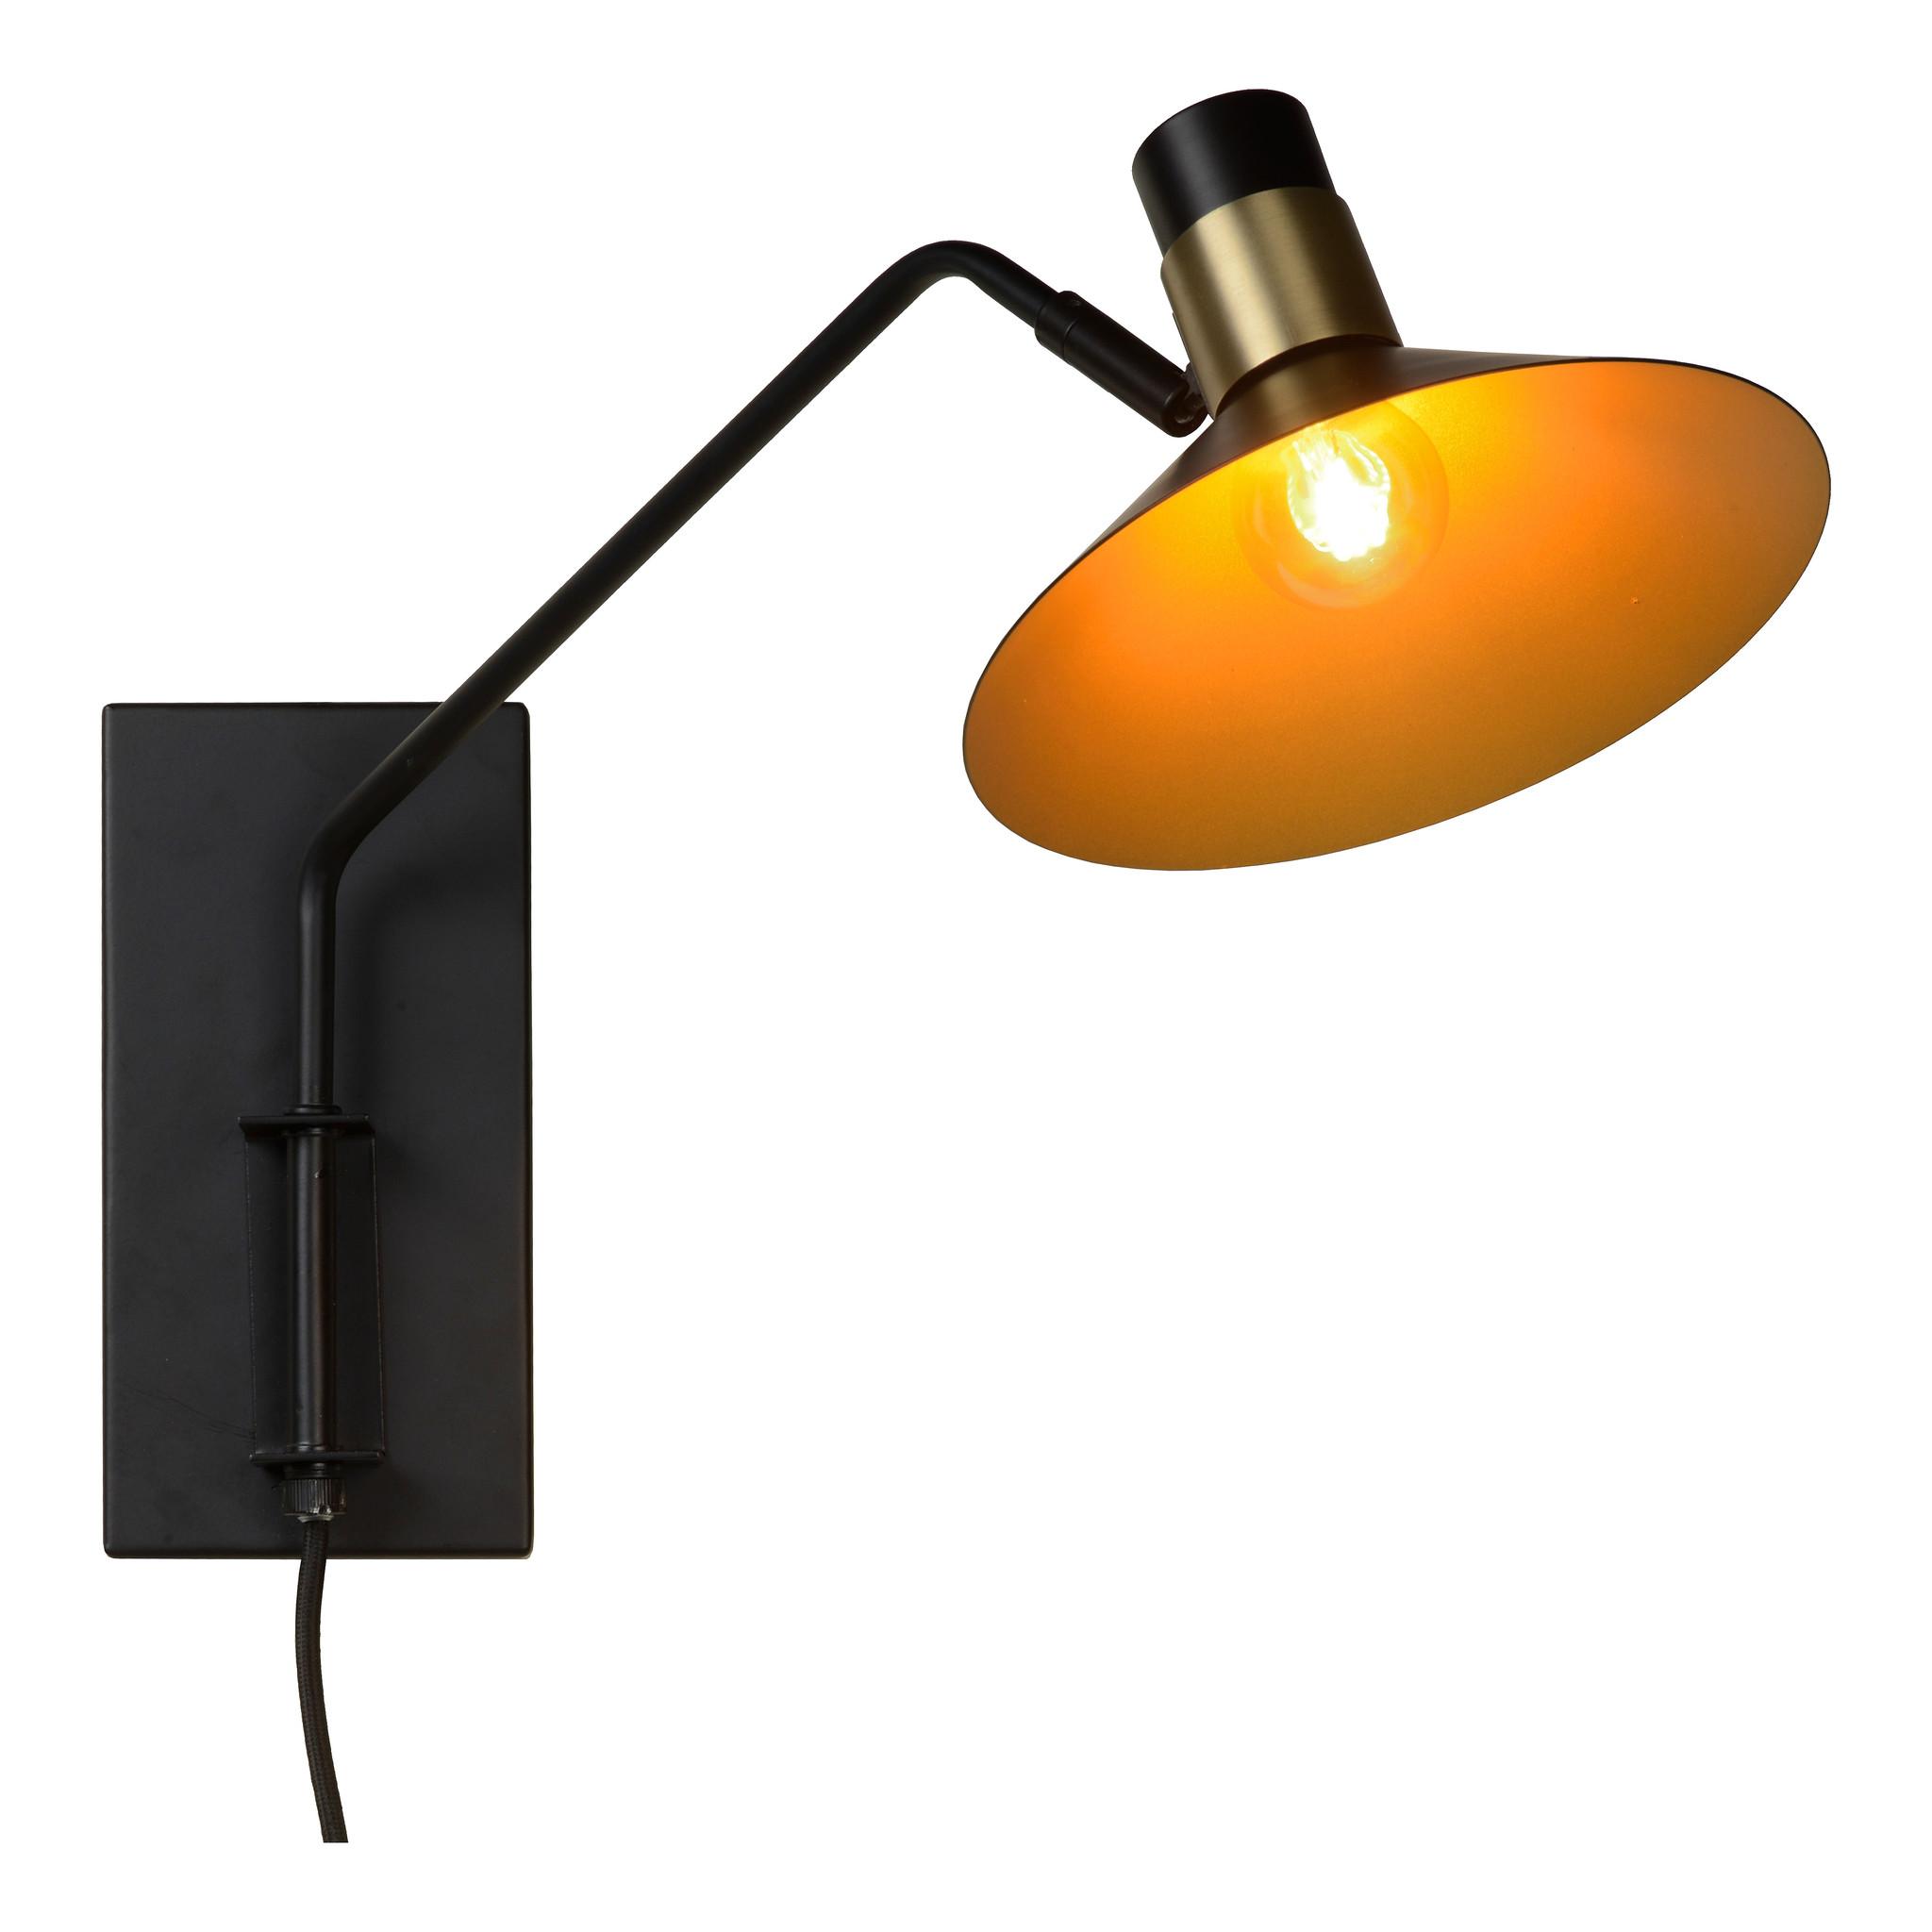 Lucide PEPIJN Wandlamp-Zwart-1xE14-40W-3 StepDim-Staal